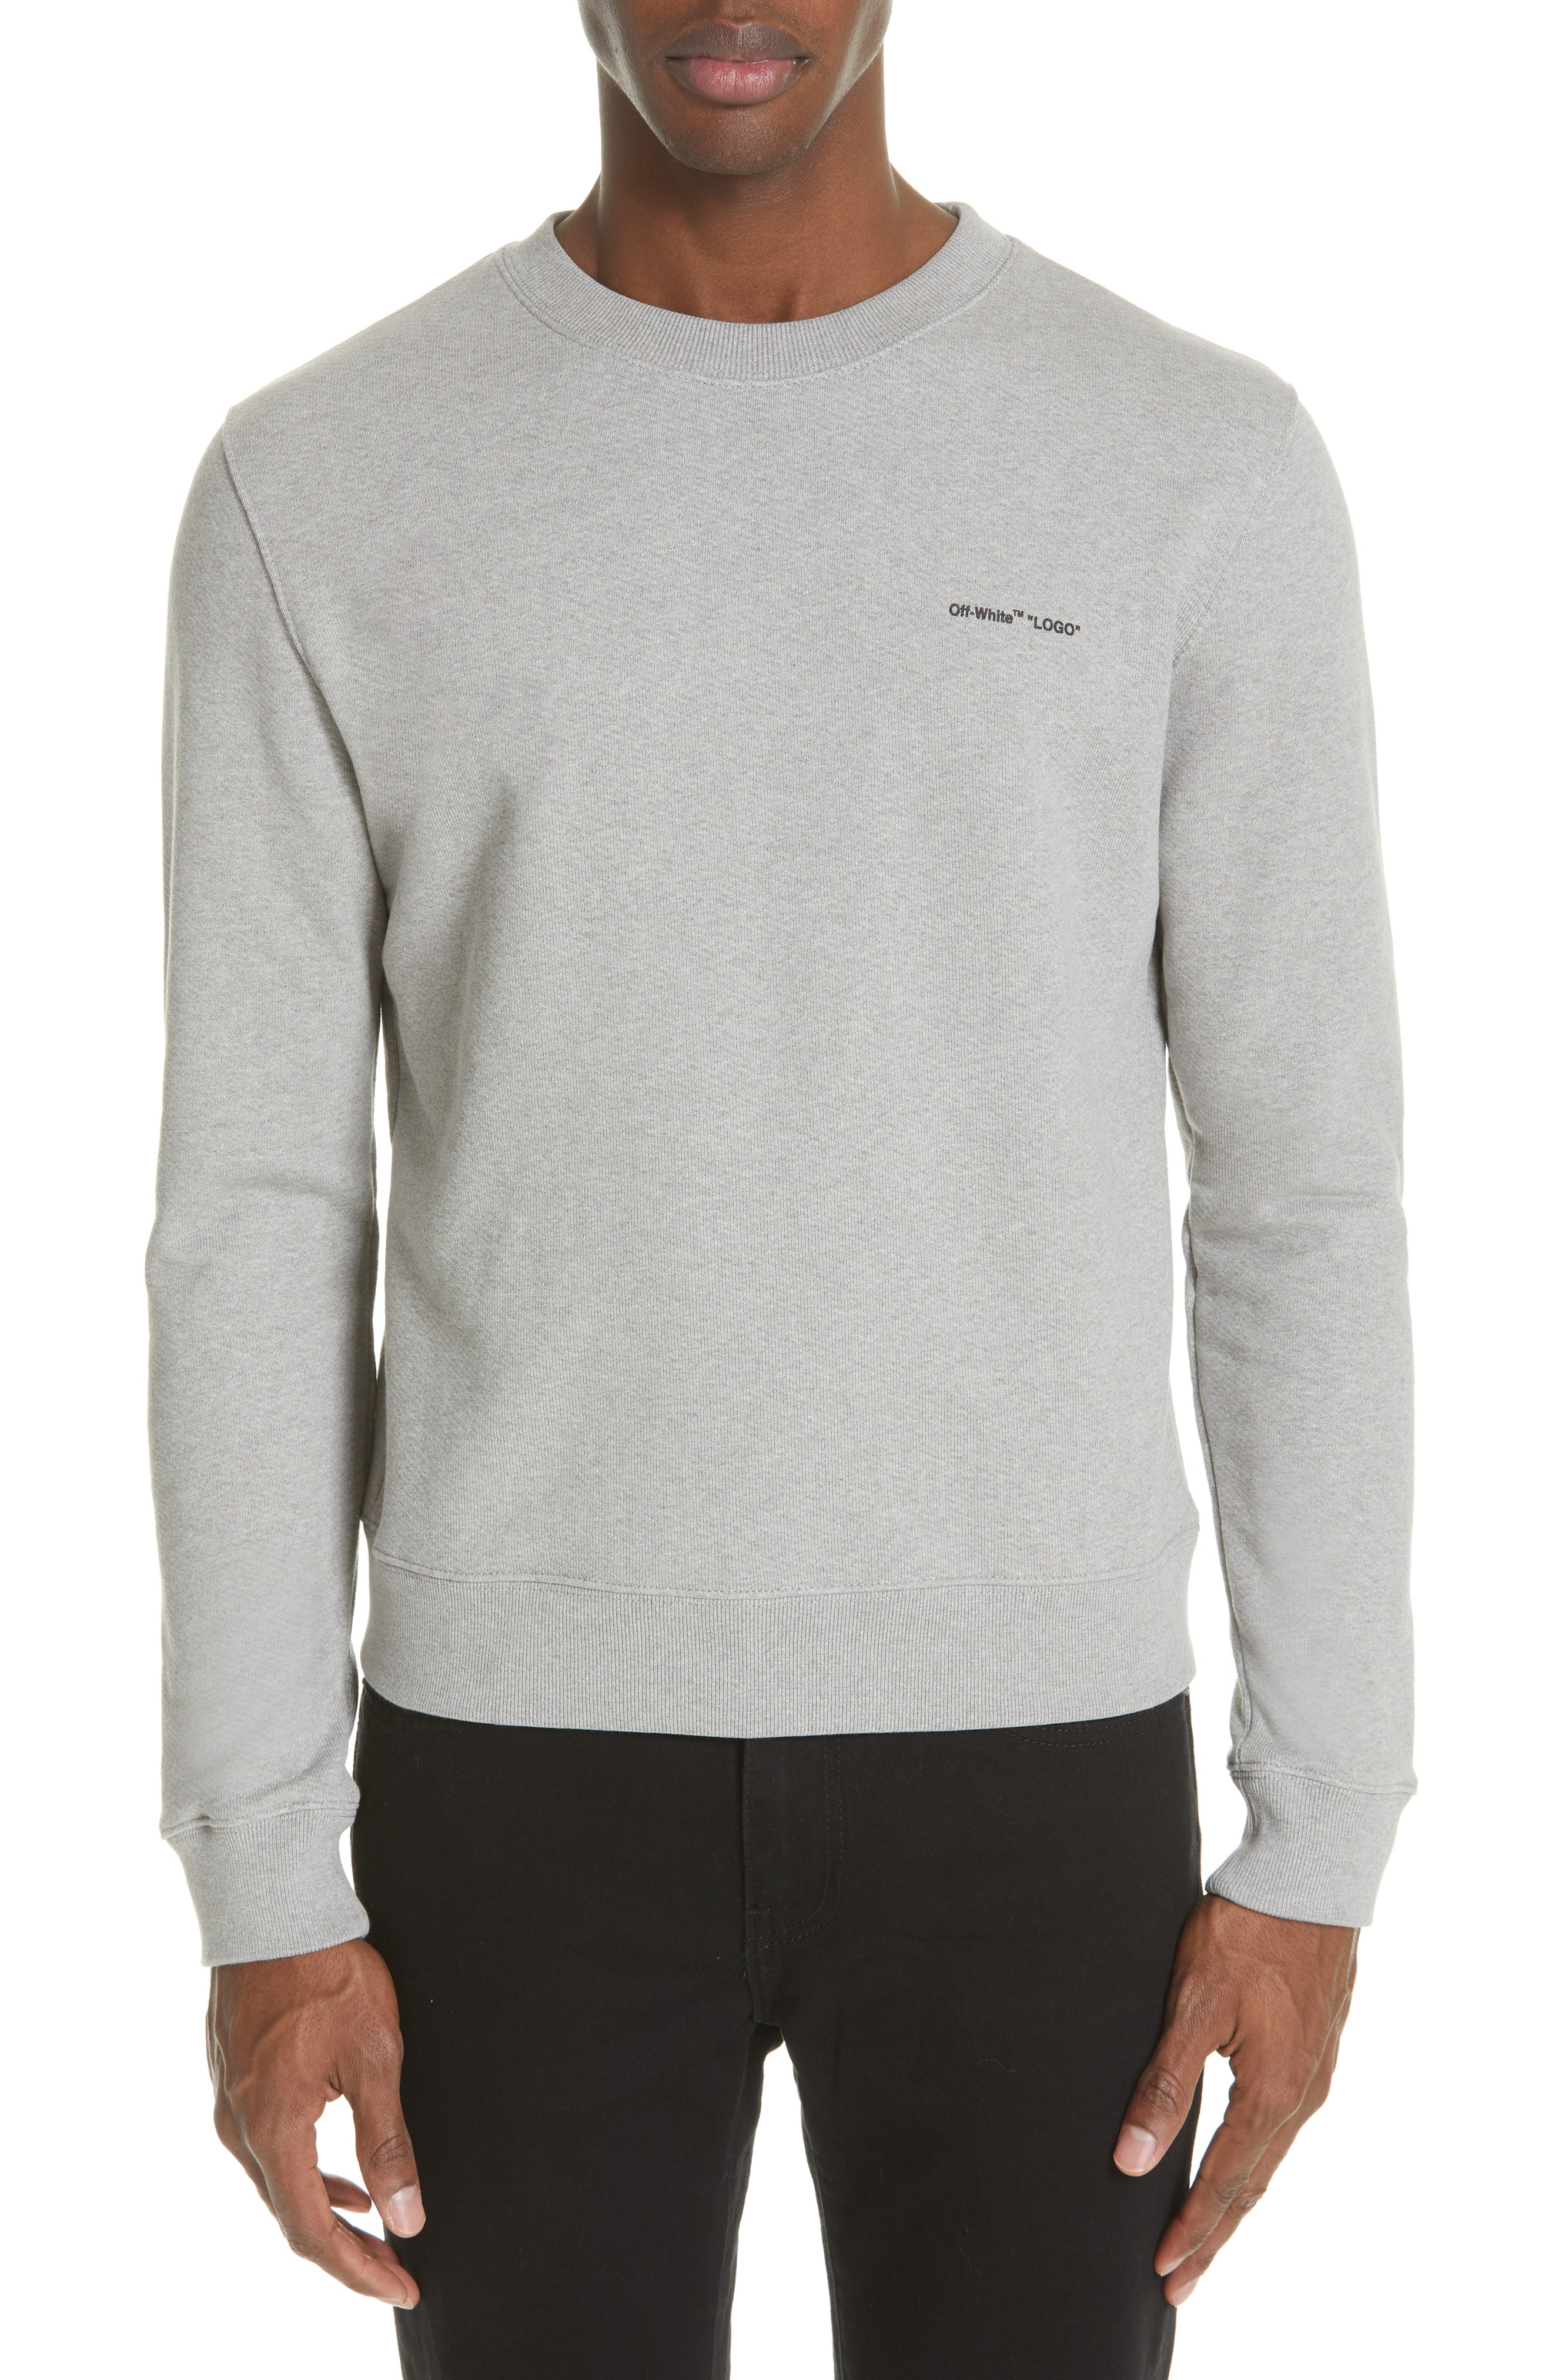 94ec5f200 Men's Off-White Slim Fit Logo Sweatshirt, Size Small – Grey | The ...